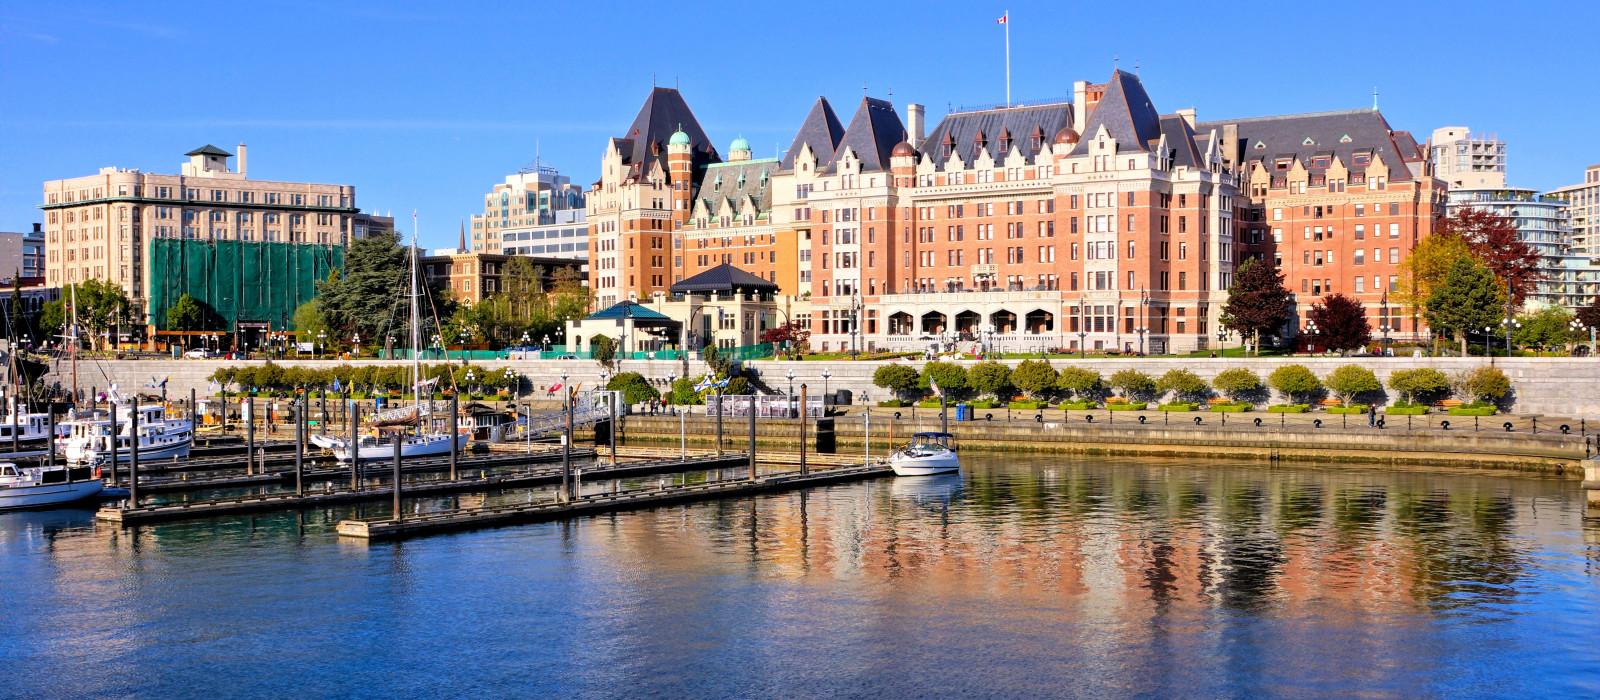 Reiseziel Victoria Kanada